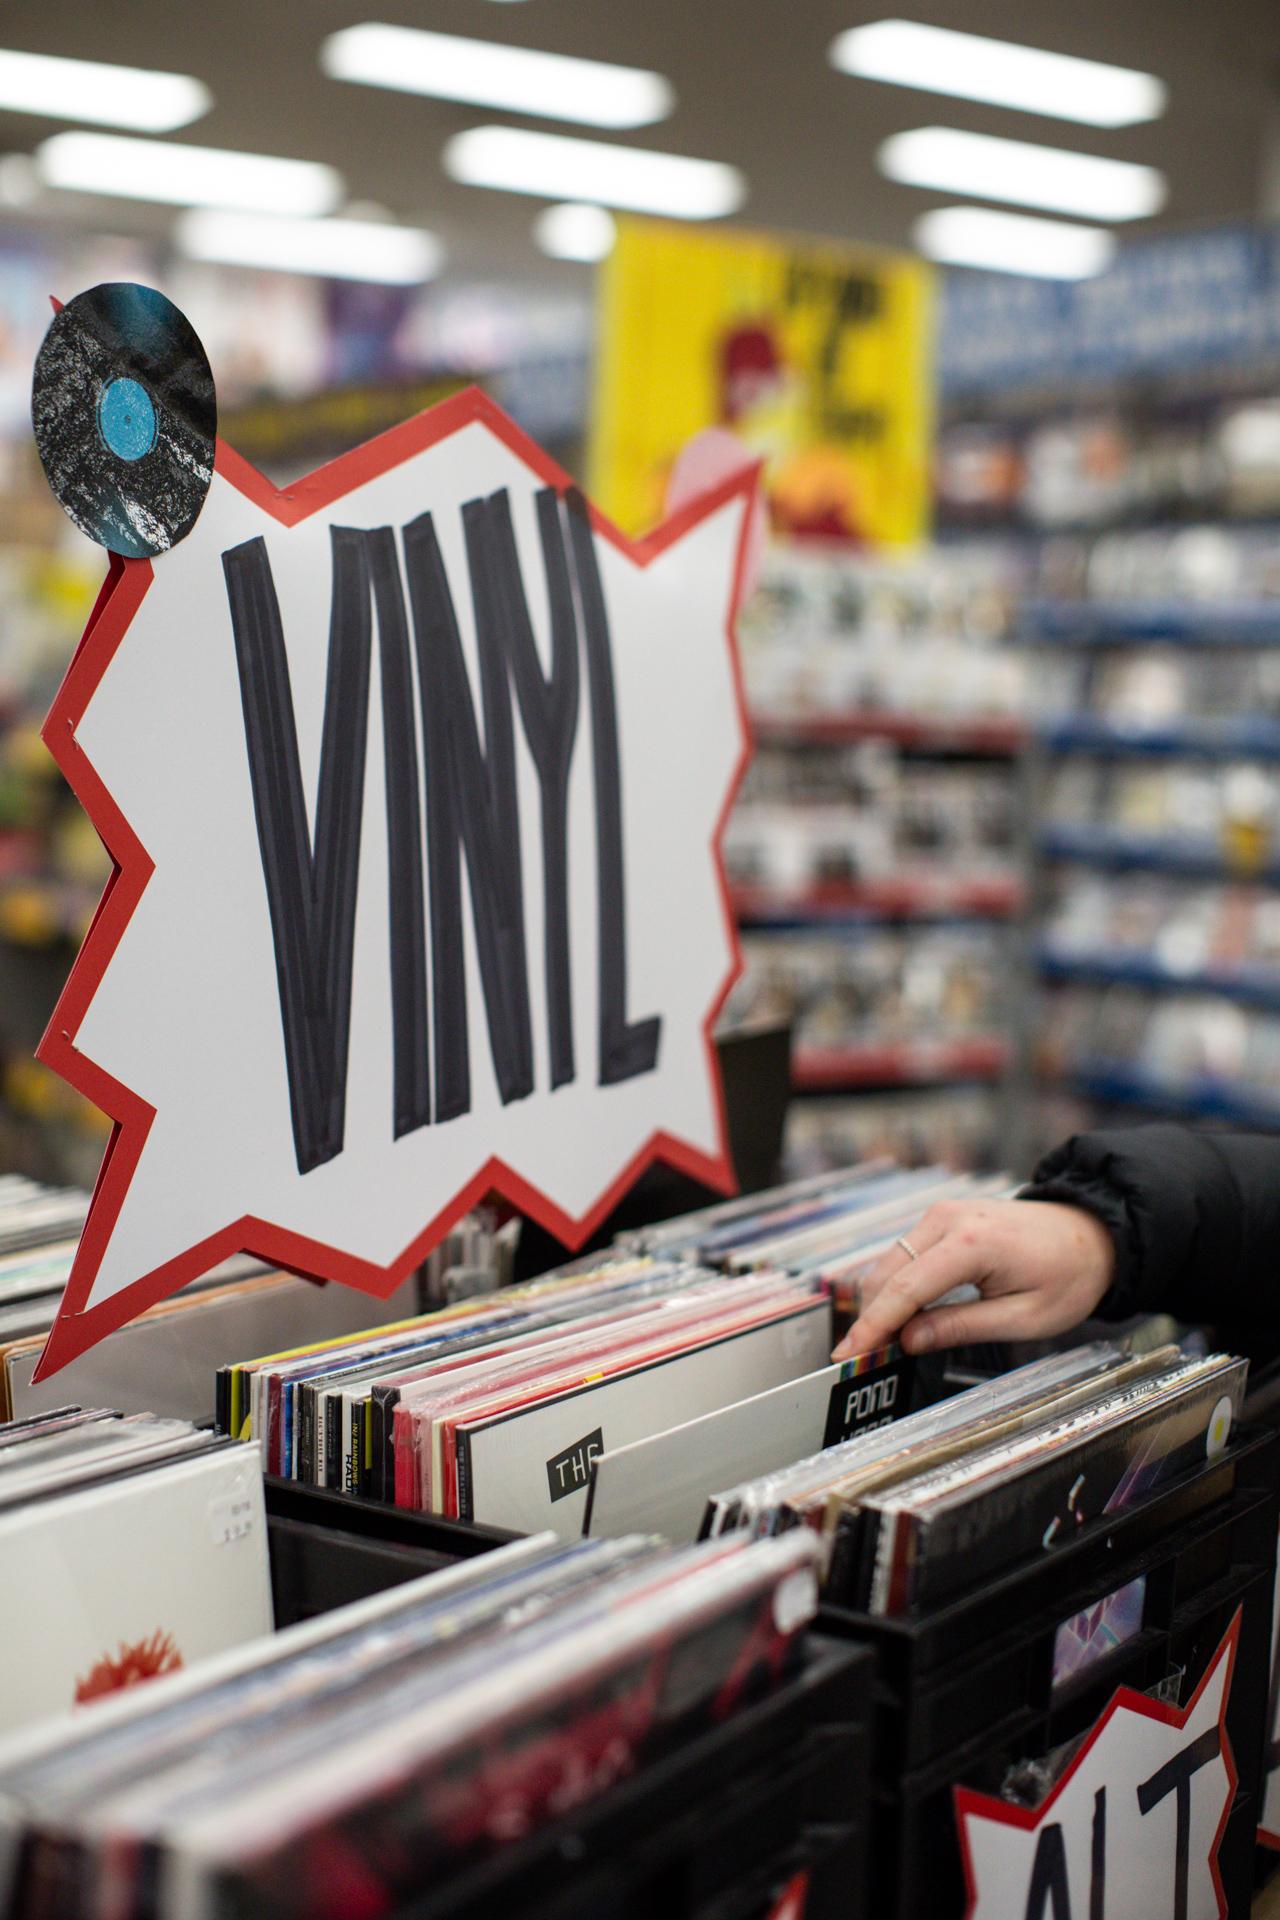 JB Hi Fi music vinyl shop